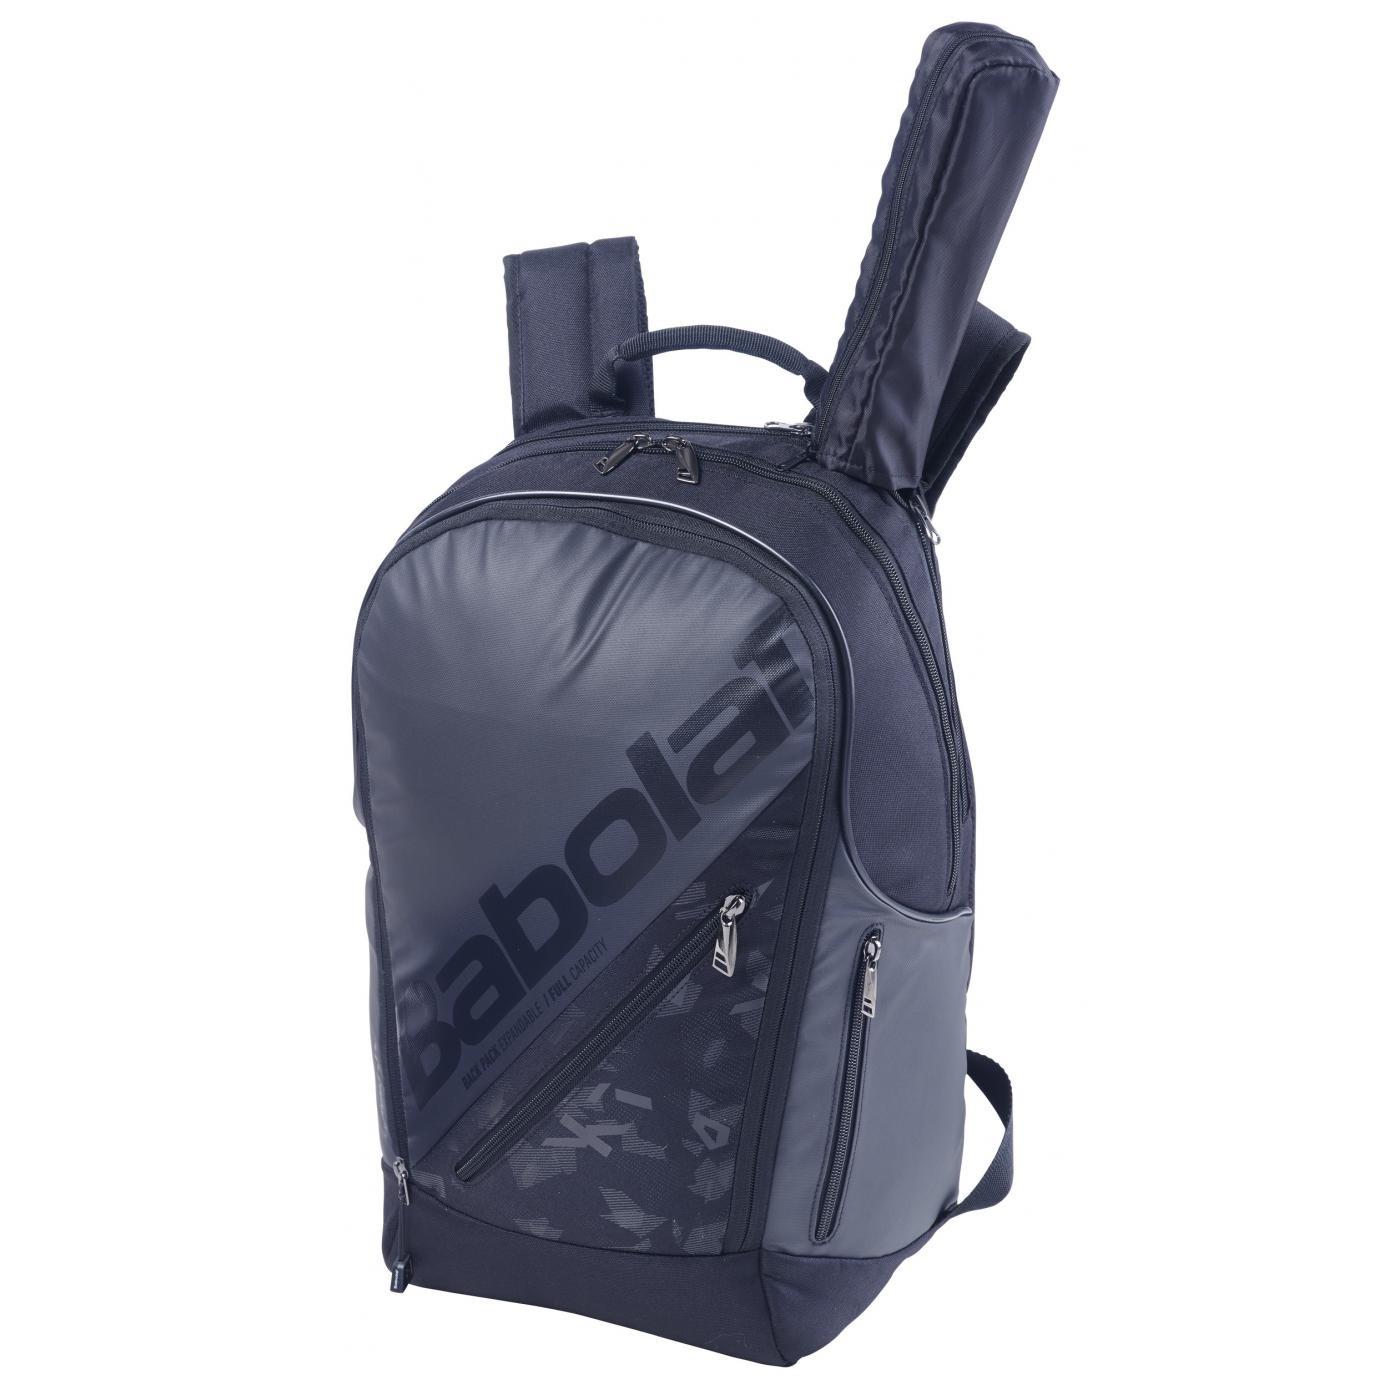 Plecak tenisowy Babolat Team Expandable Backpack Black